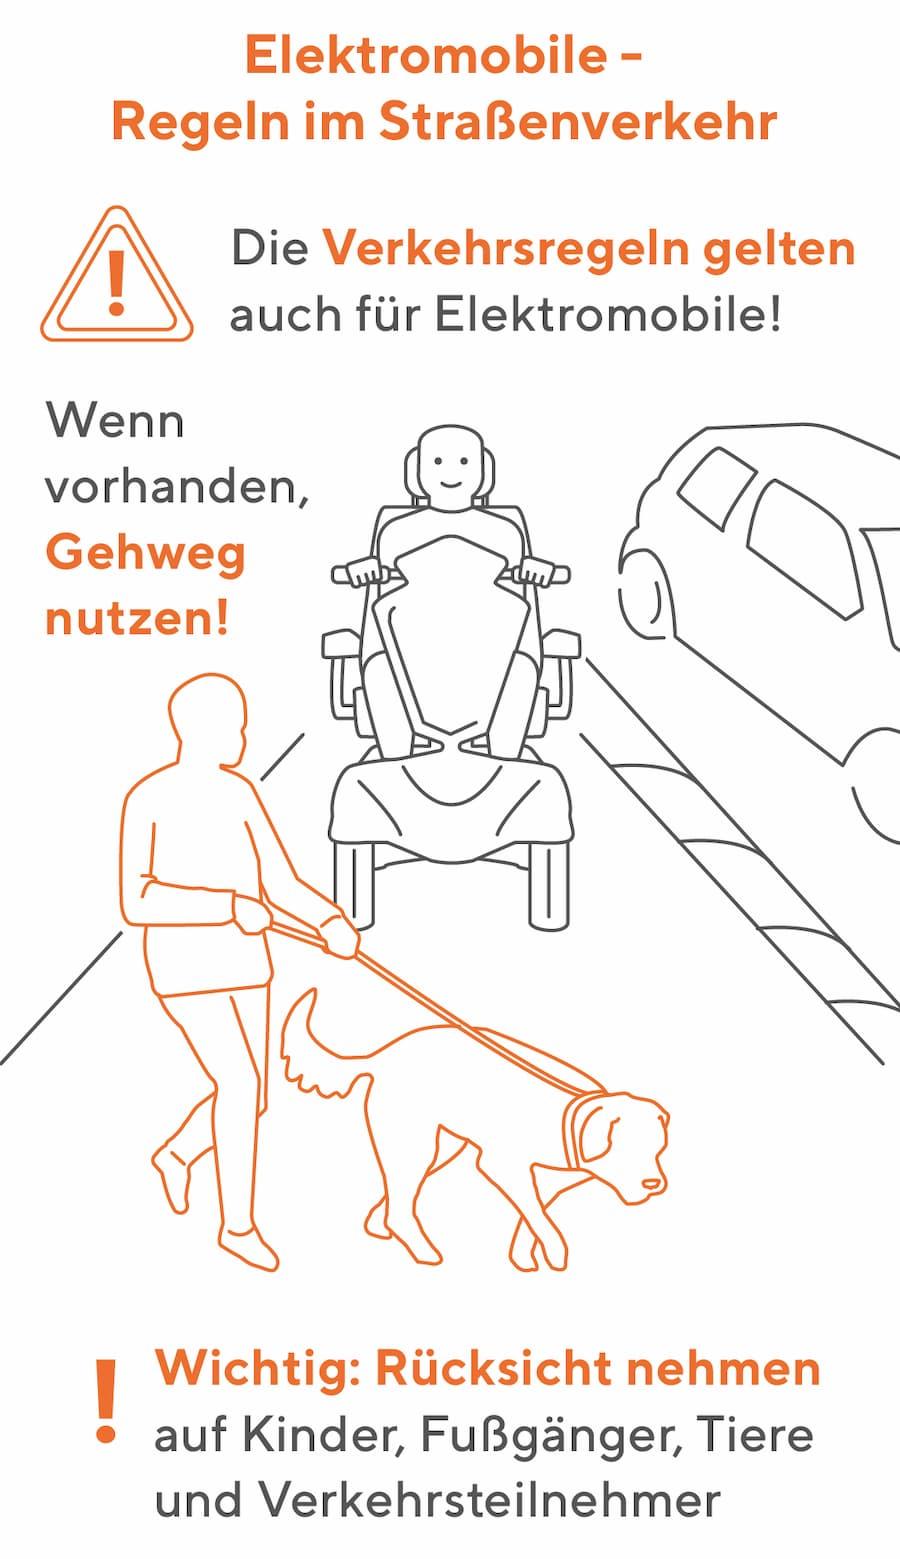 Elektromobil: Regeln im Straßenverkehr